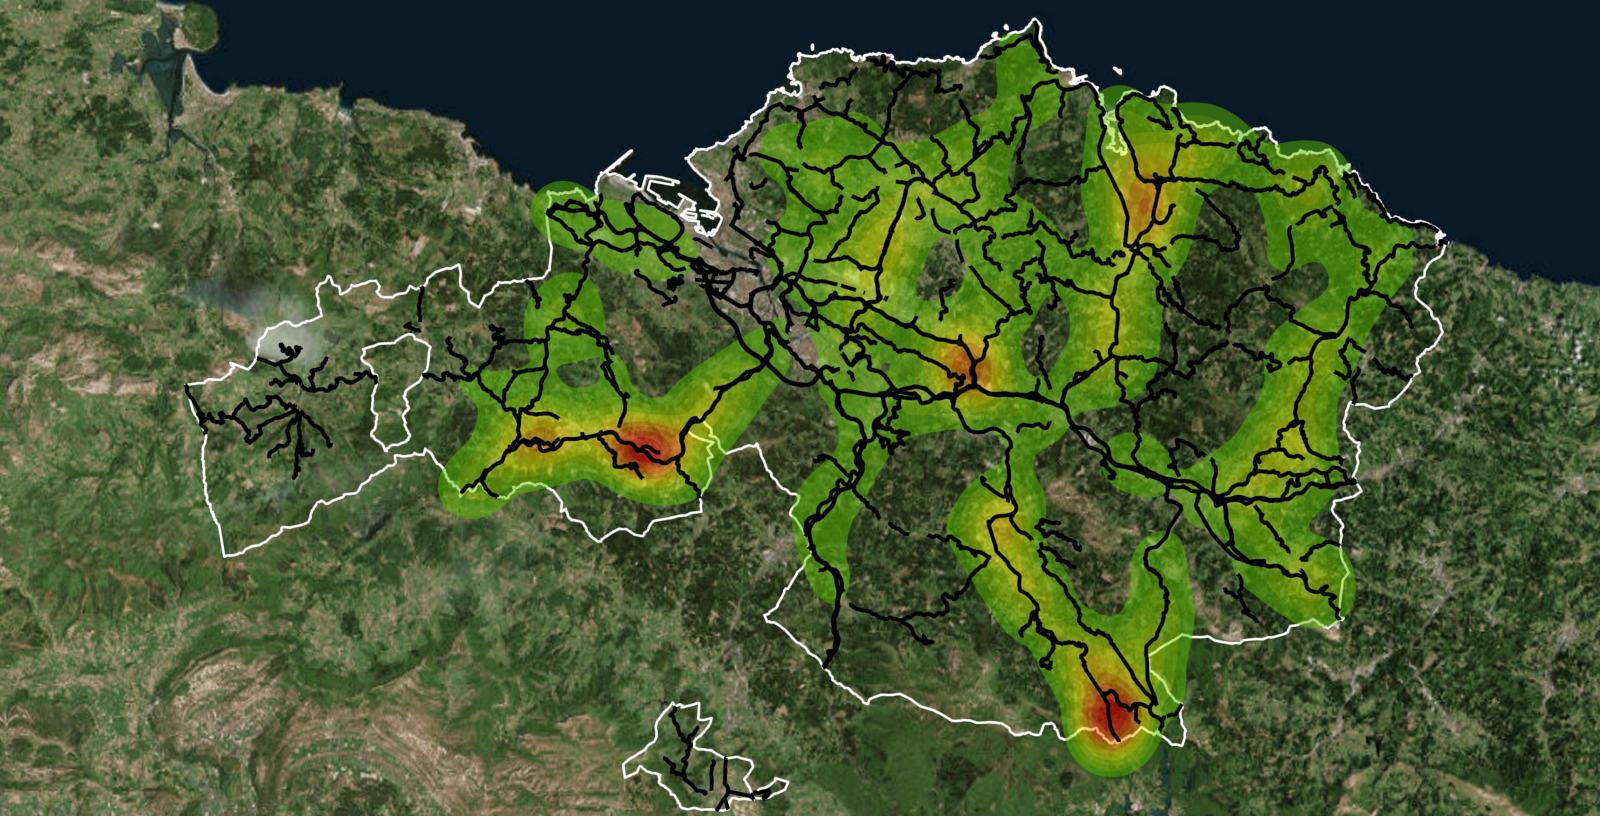 Permeabilidad fauna carreteras_Diputacion Foral Bizkaia_IDOM_1